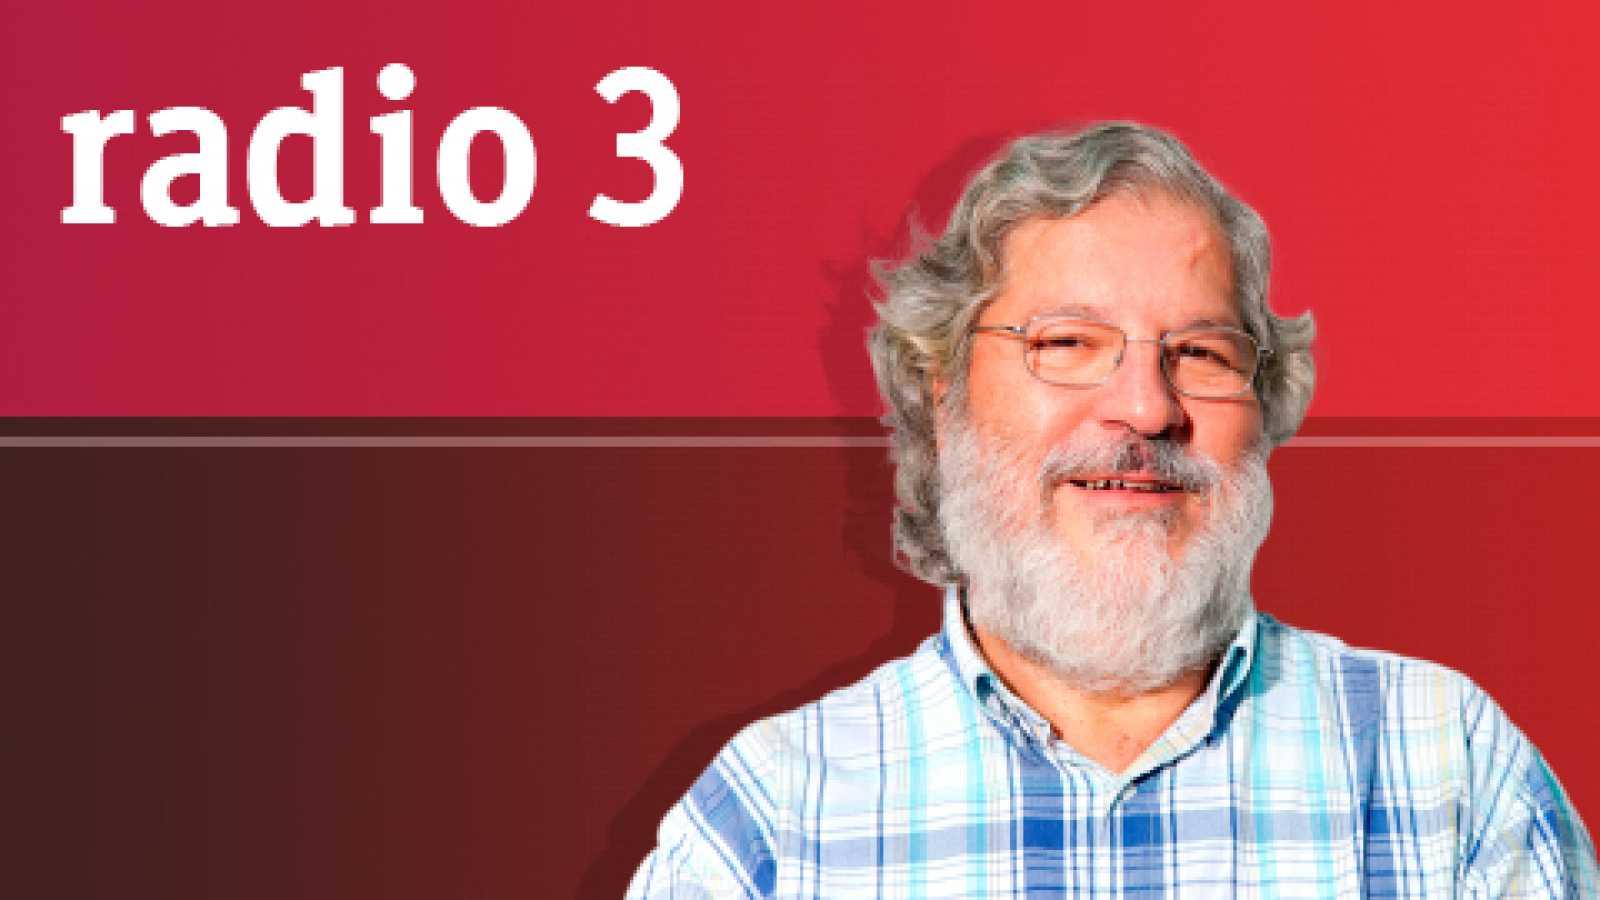 Discópolis 11.244 - Orígenes Jazz: de África al Rag (I) - 02/03/21 - escuchar ahora